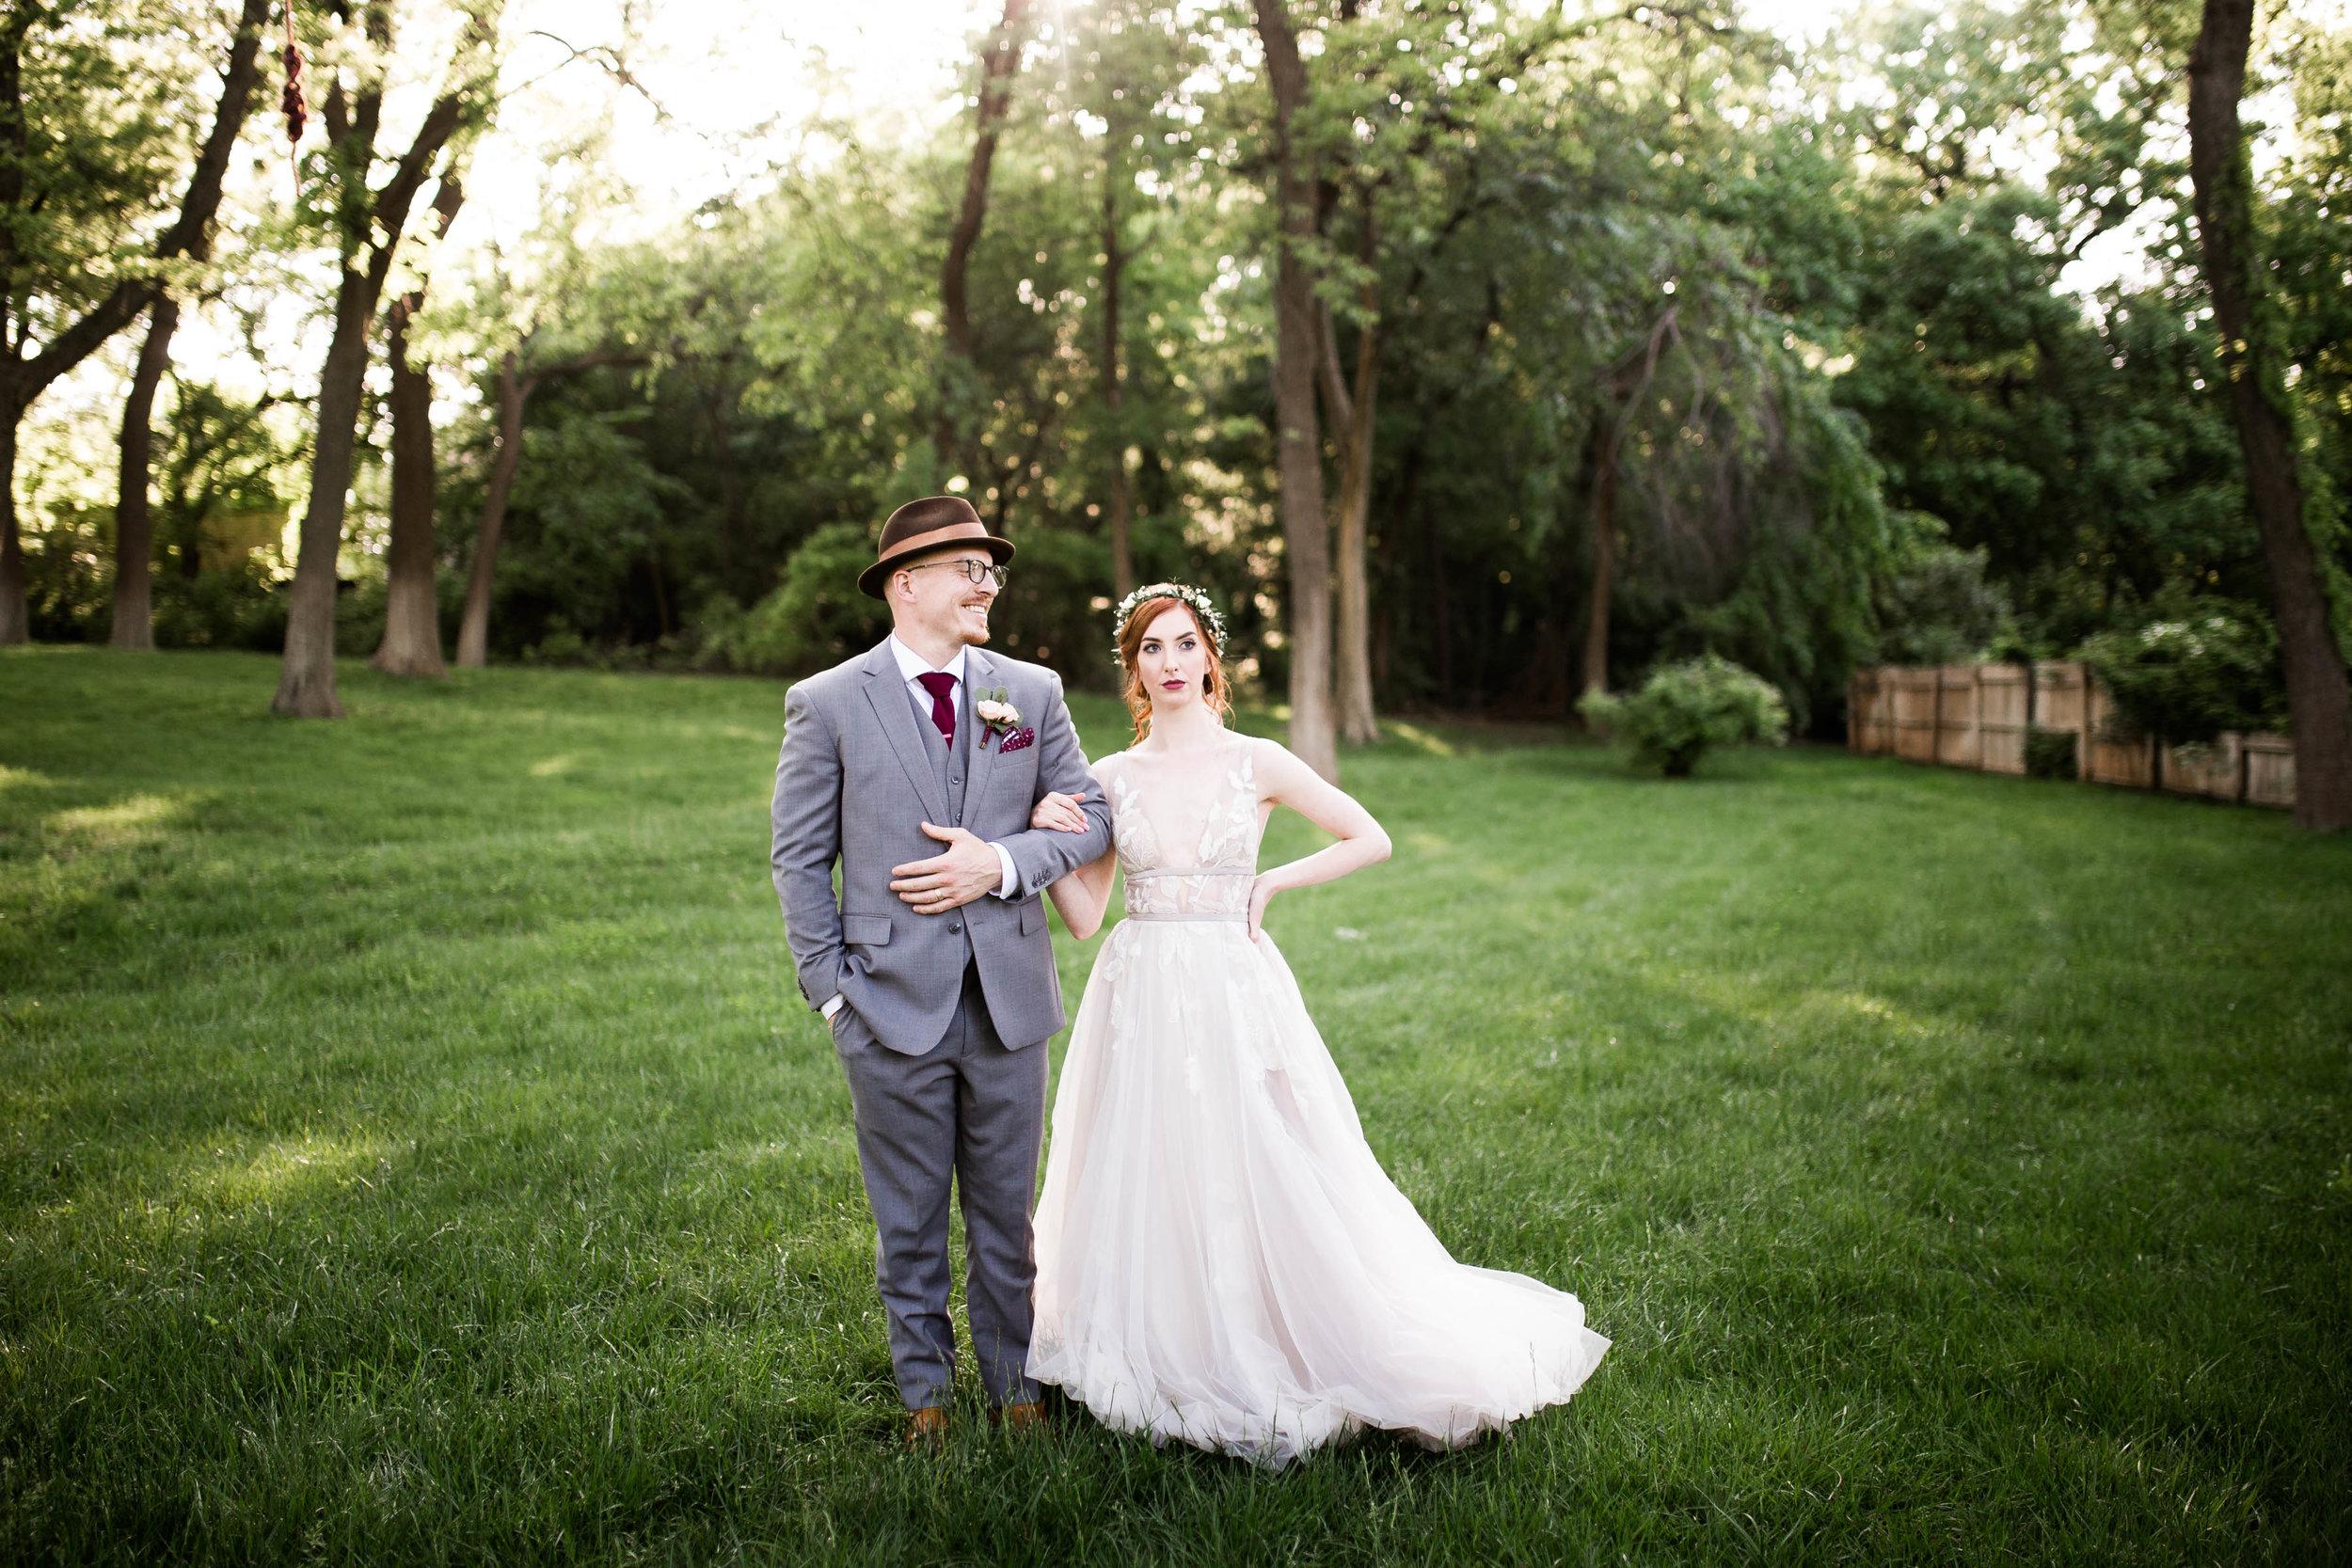 armstrong-wedding-567.jpg